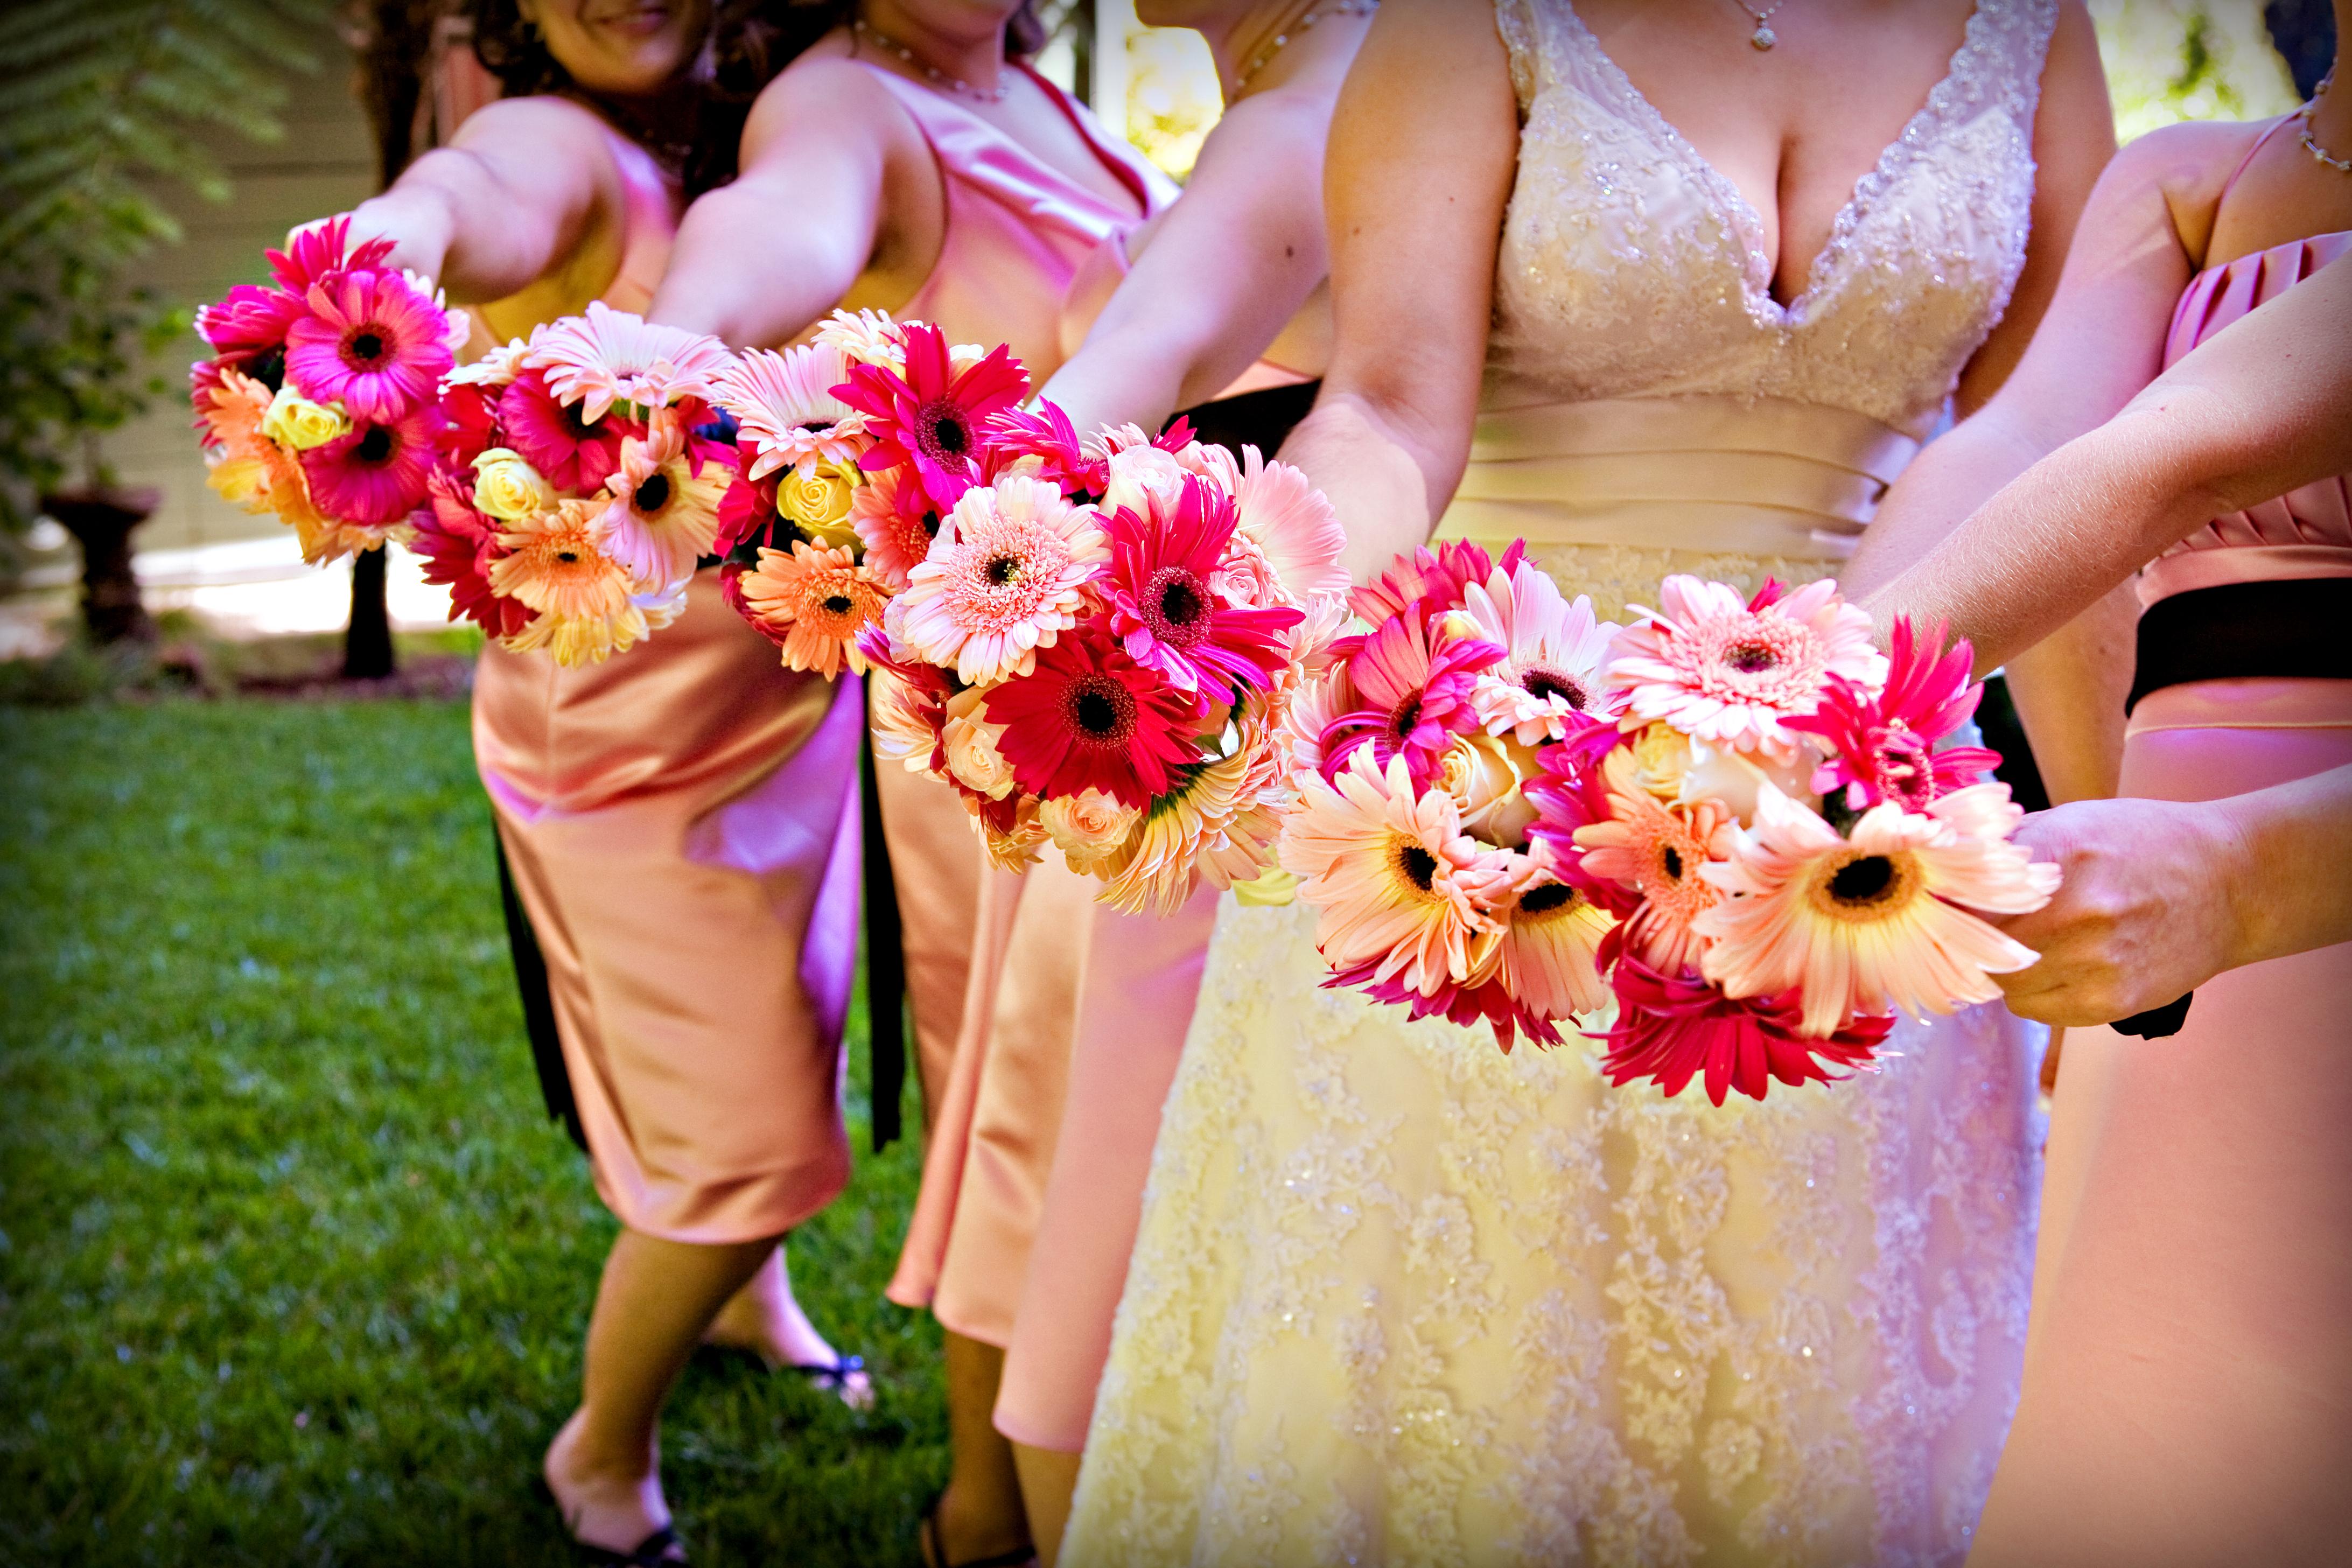 Ceremony, Flowers & Decor, Bridesmaids, Bridesmaids Dresses, Fashion, white, pink, black, Ceremony Flowers, Bridesmaid Bouquets, Flowers, Roses, Daisy, Bouquets, Gerbera, Gerber, My elegant event, Flower Wedding Dresses